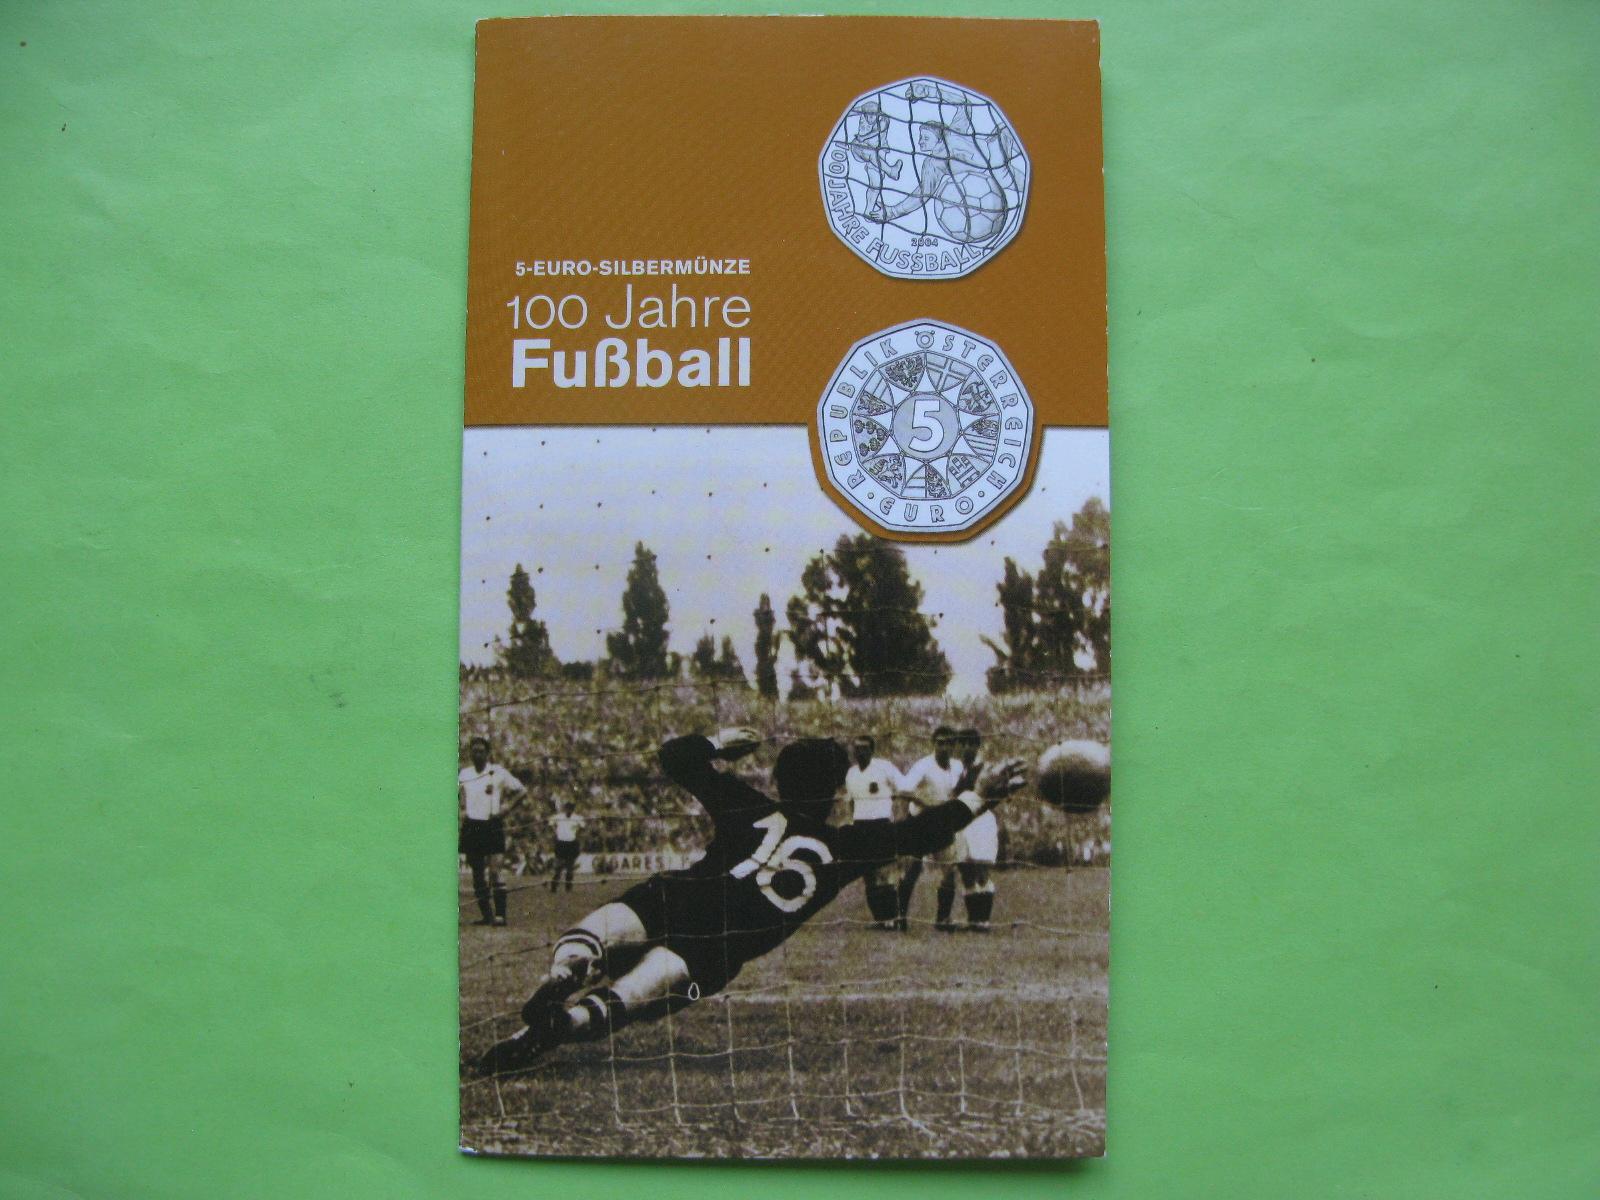 Австрия 5 евро 2004 г. 100 лет футболу